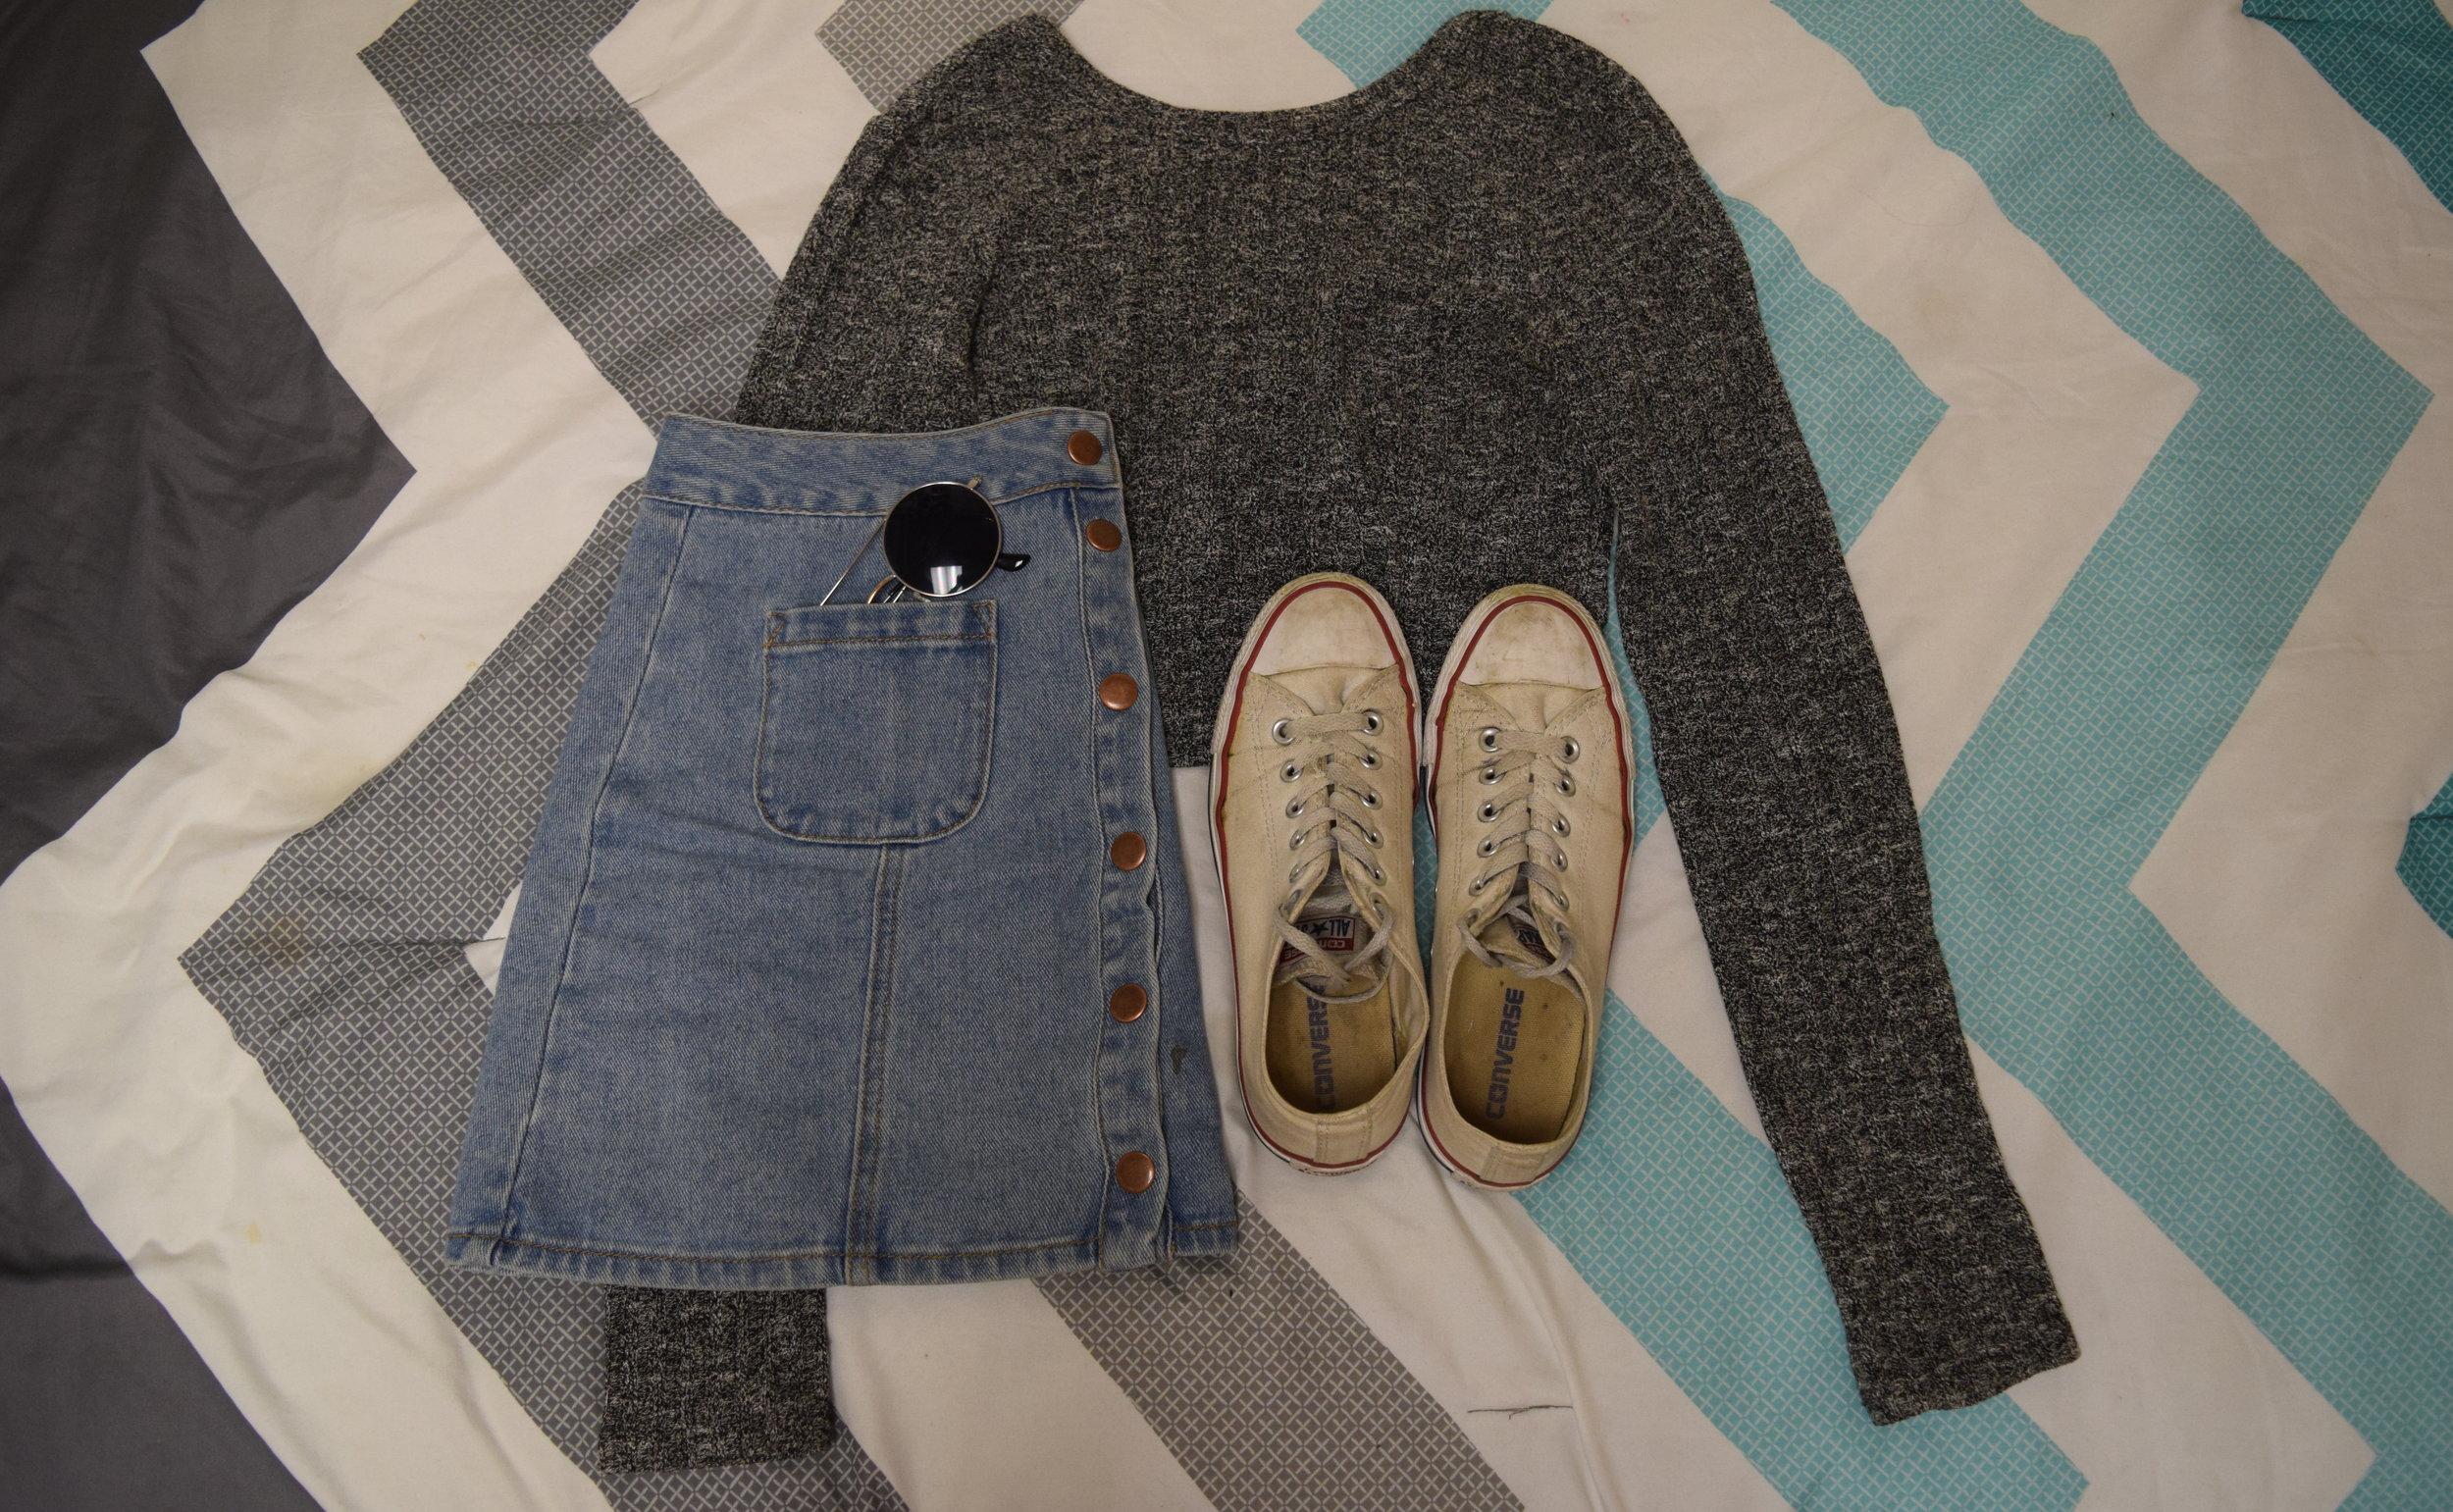 Sweater  (similar).  Skirt  (different color).  Sneakers .  Sunglasses  (similar).